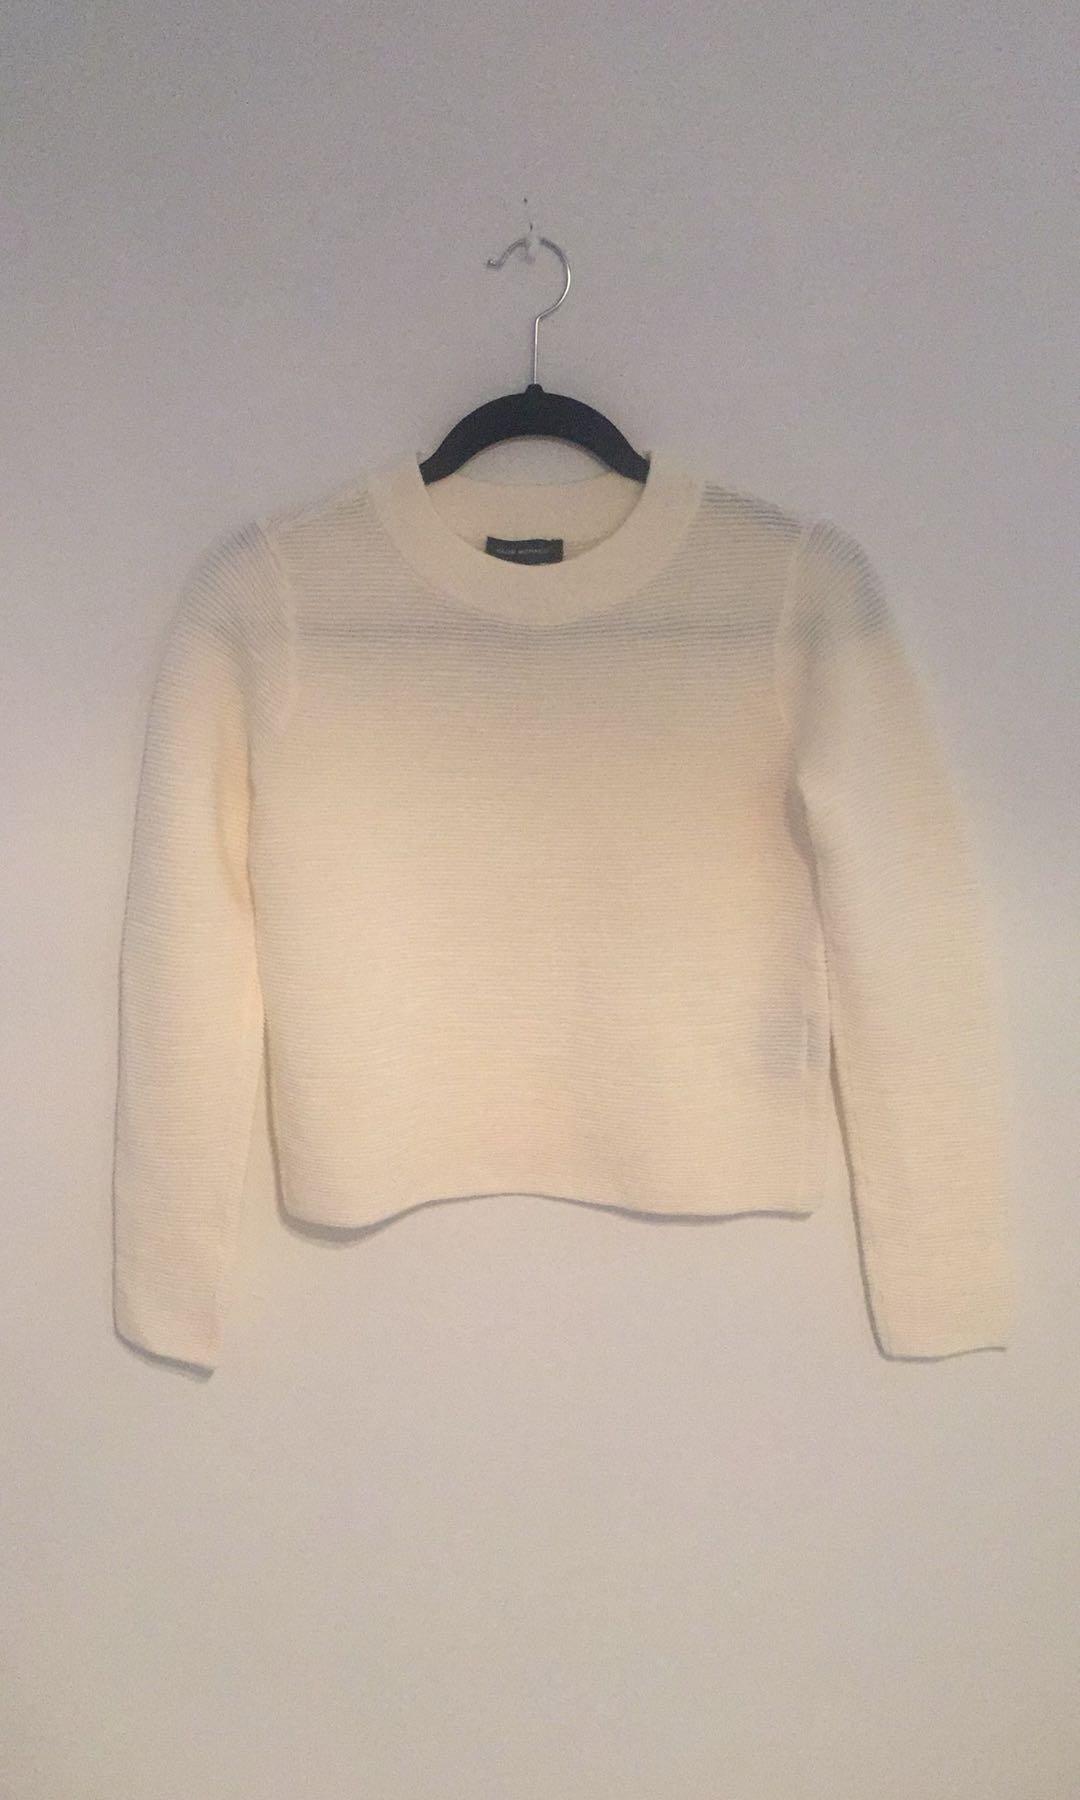 Banana Republic Sweater (XS)